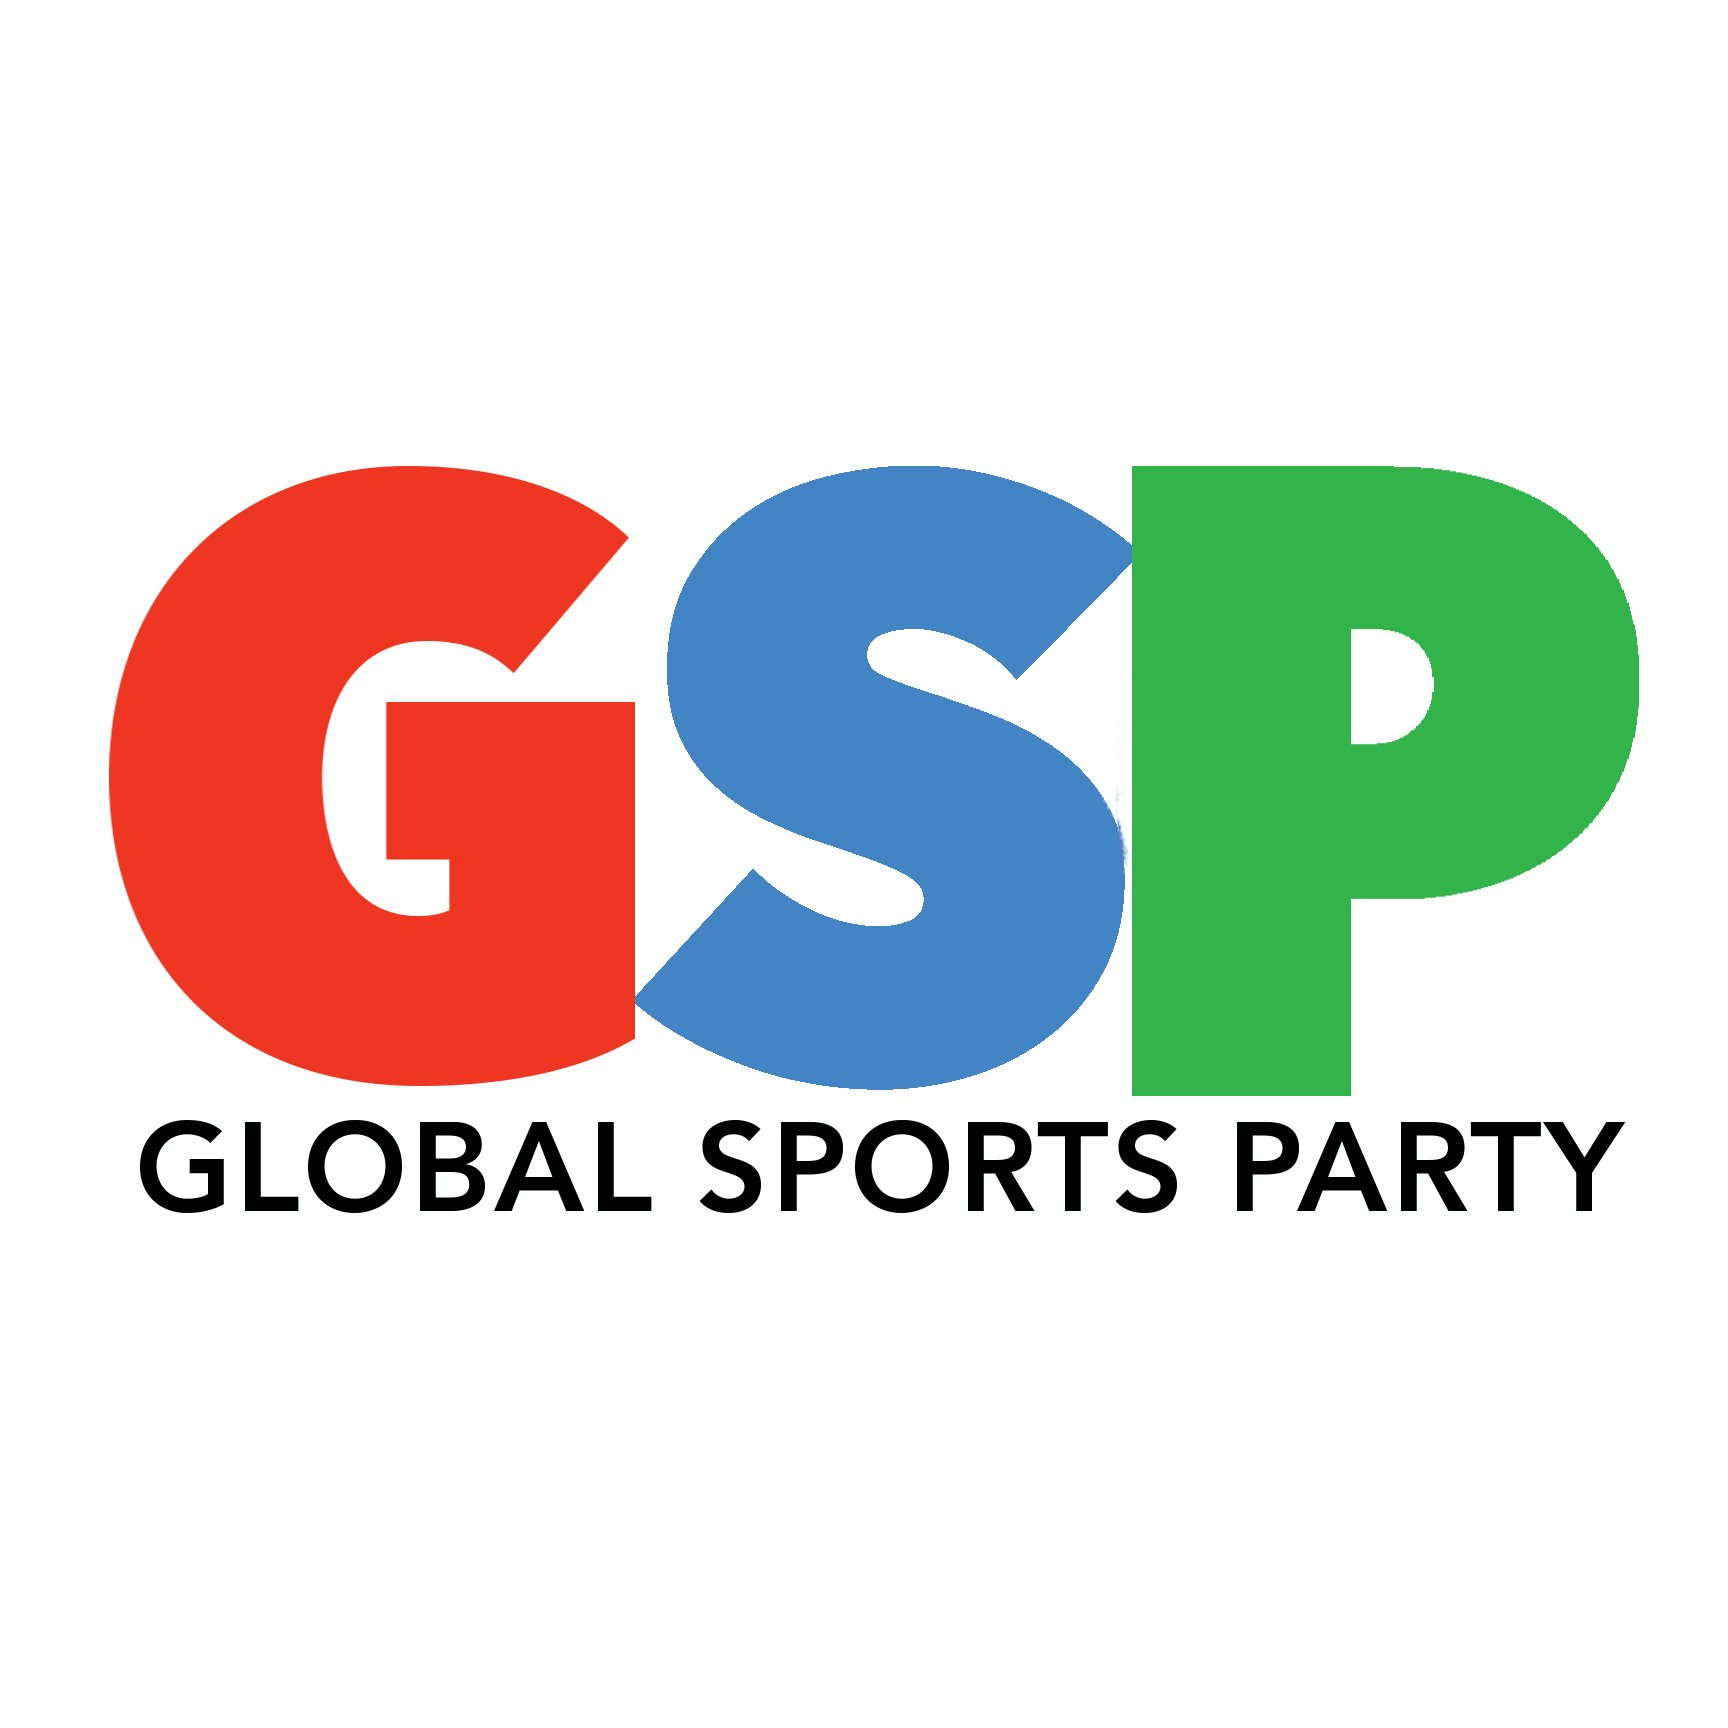 GlobalSportsParty